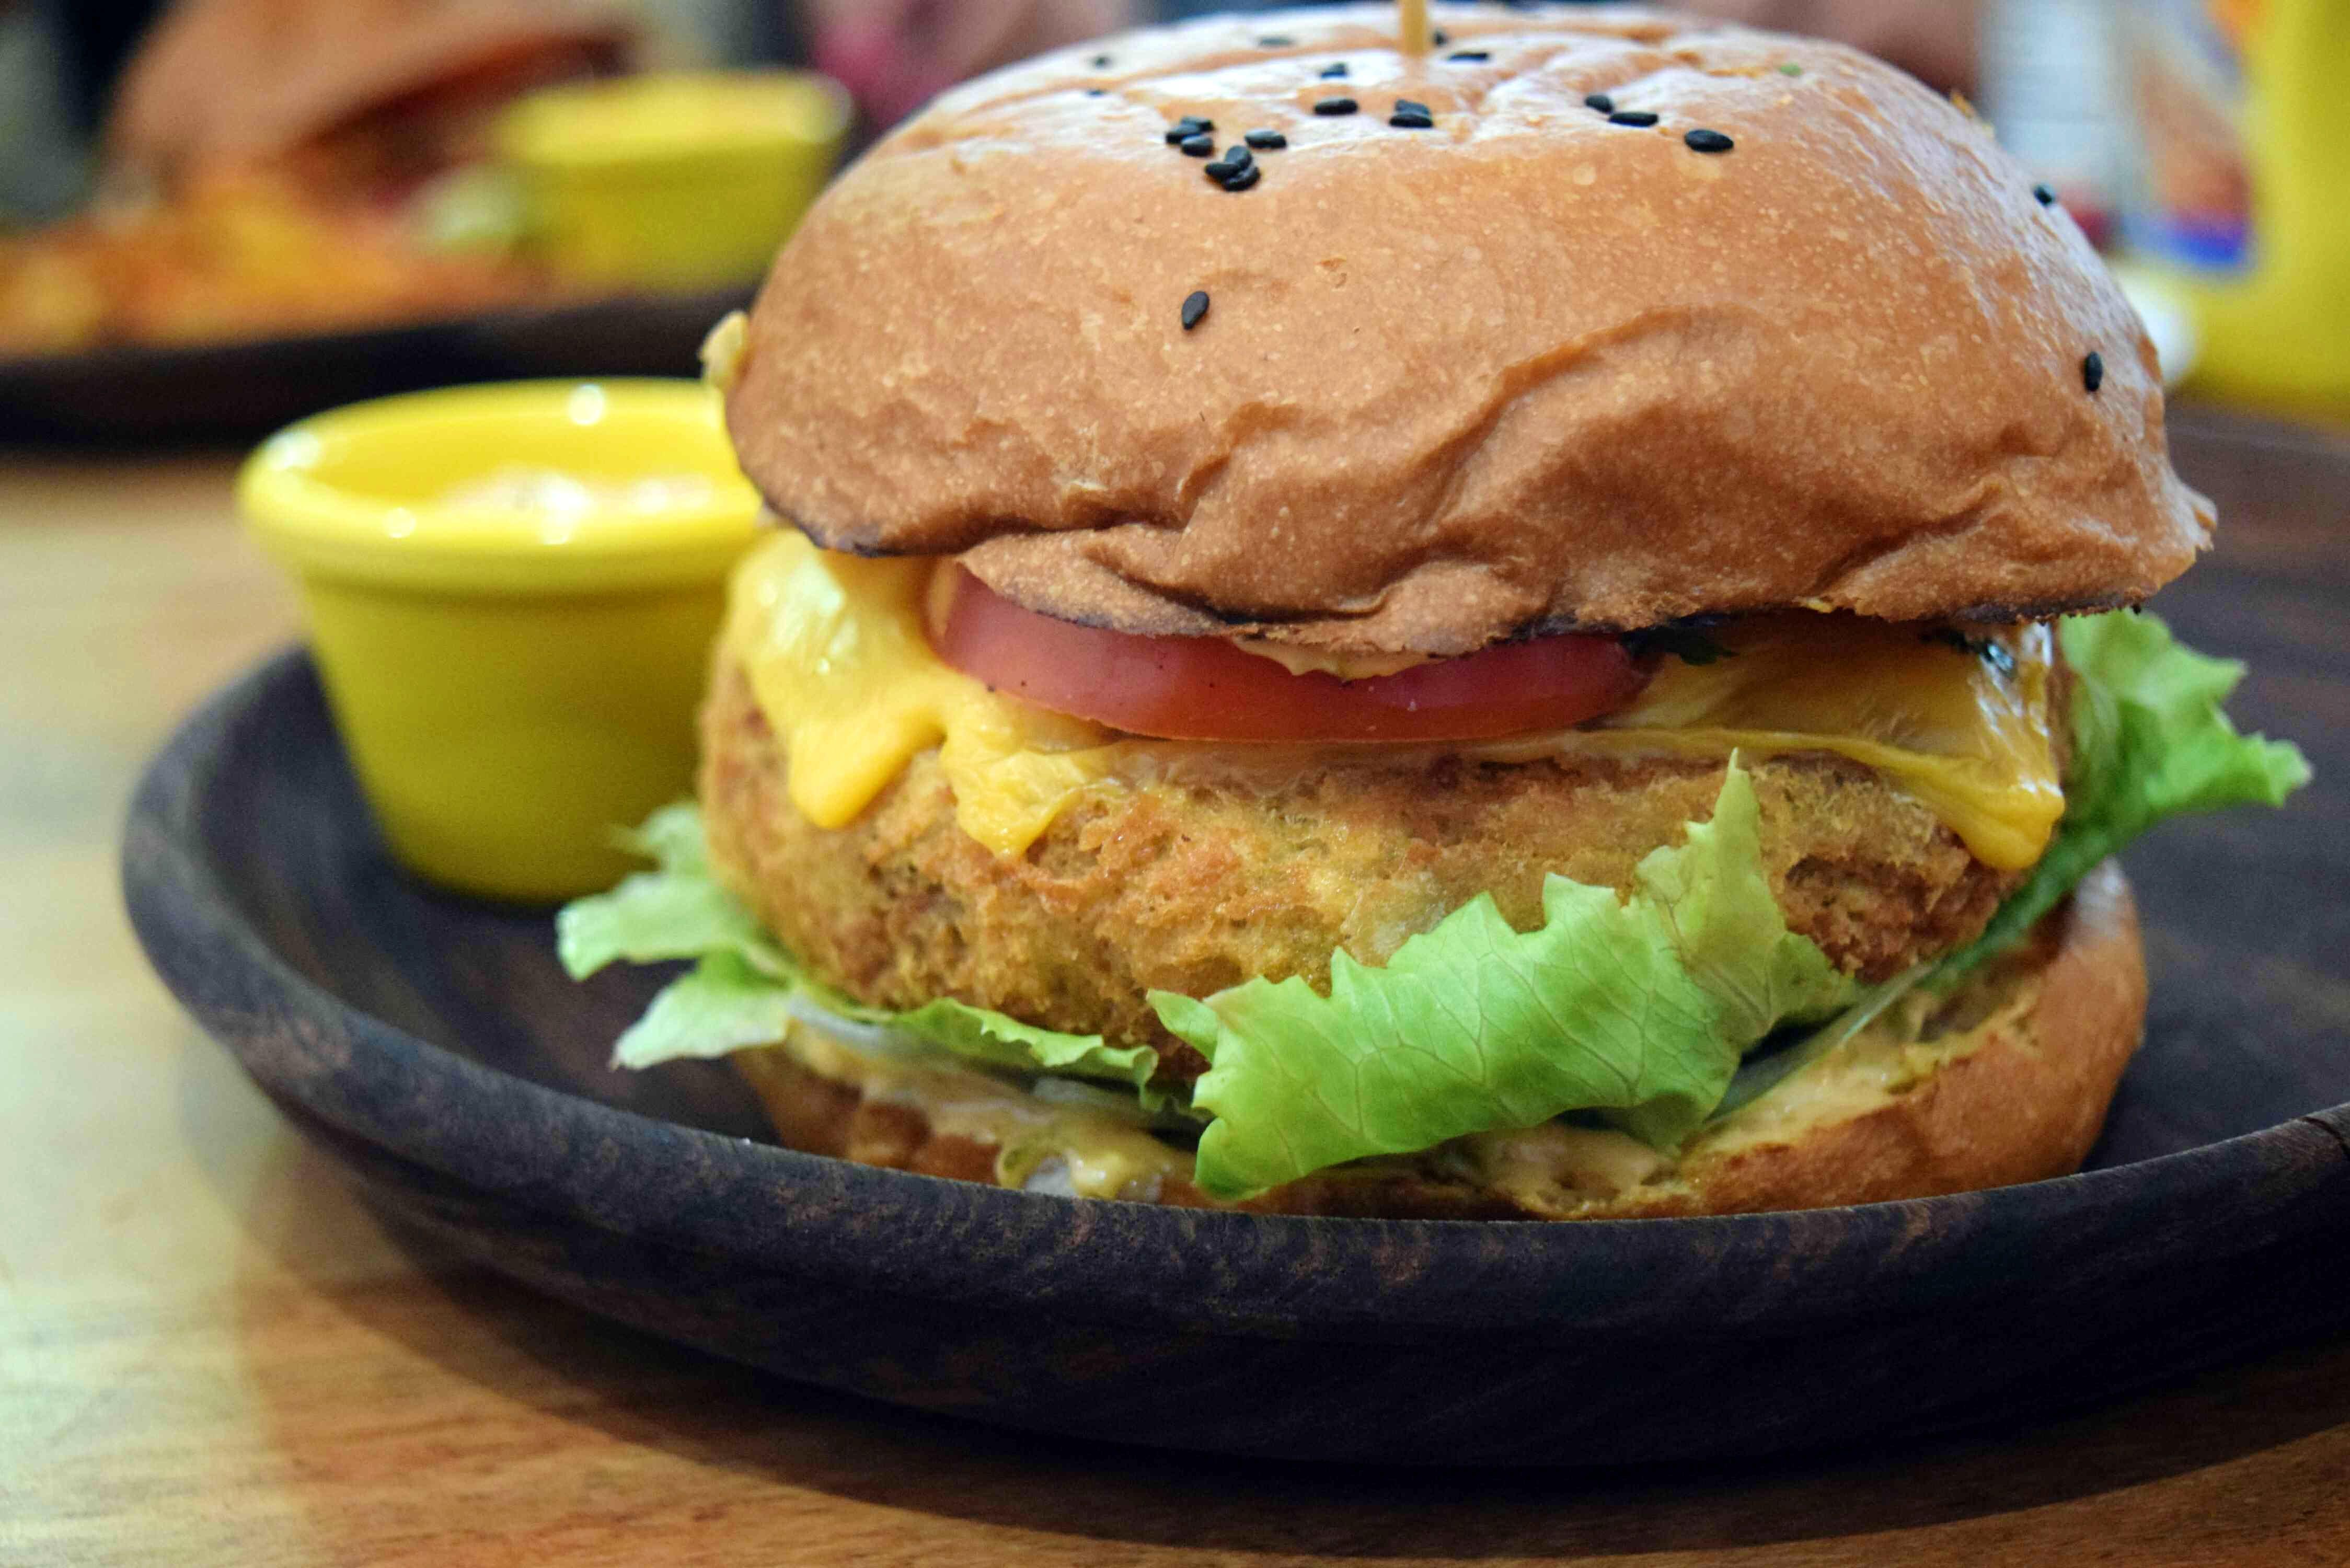 Dish,Food,Cuisine,Hamburger,Breakfast sandwich,Buffalo burger,Fast food,Veggie burger,Salmon burger,Ingredient